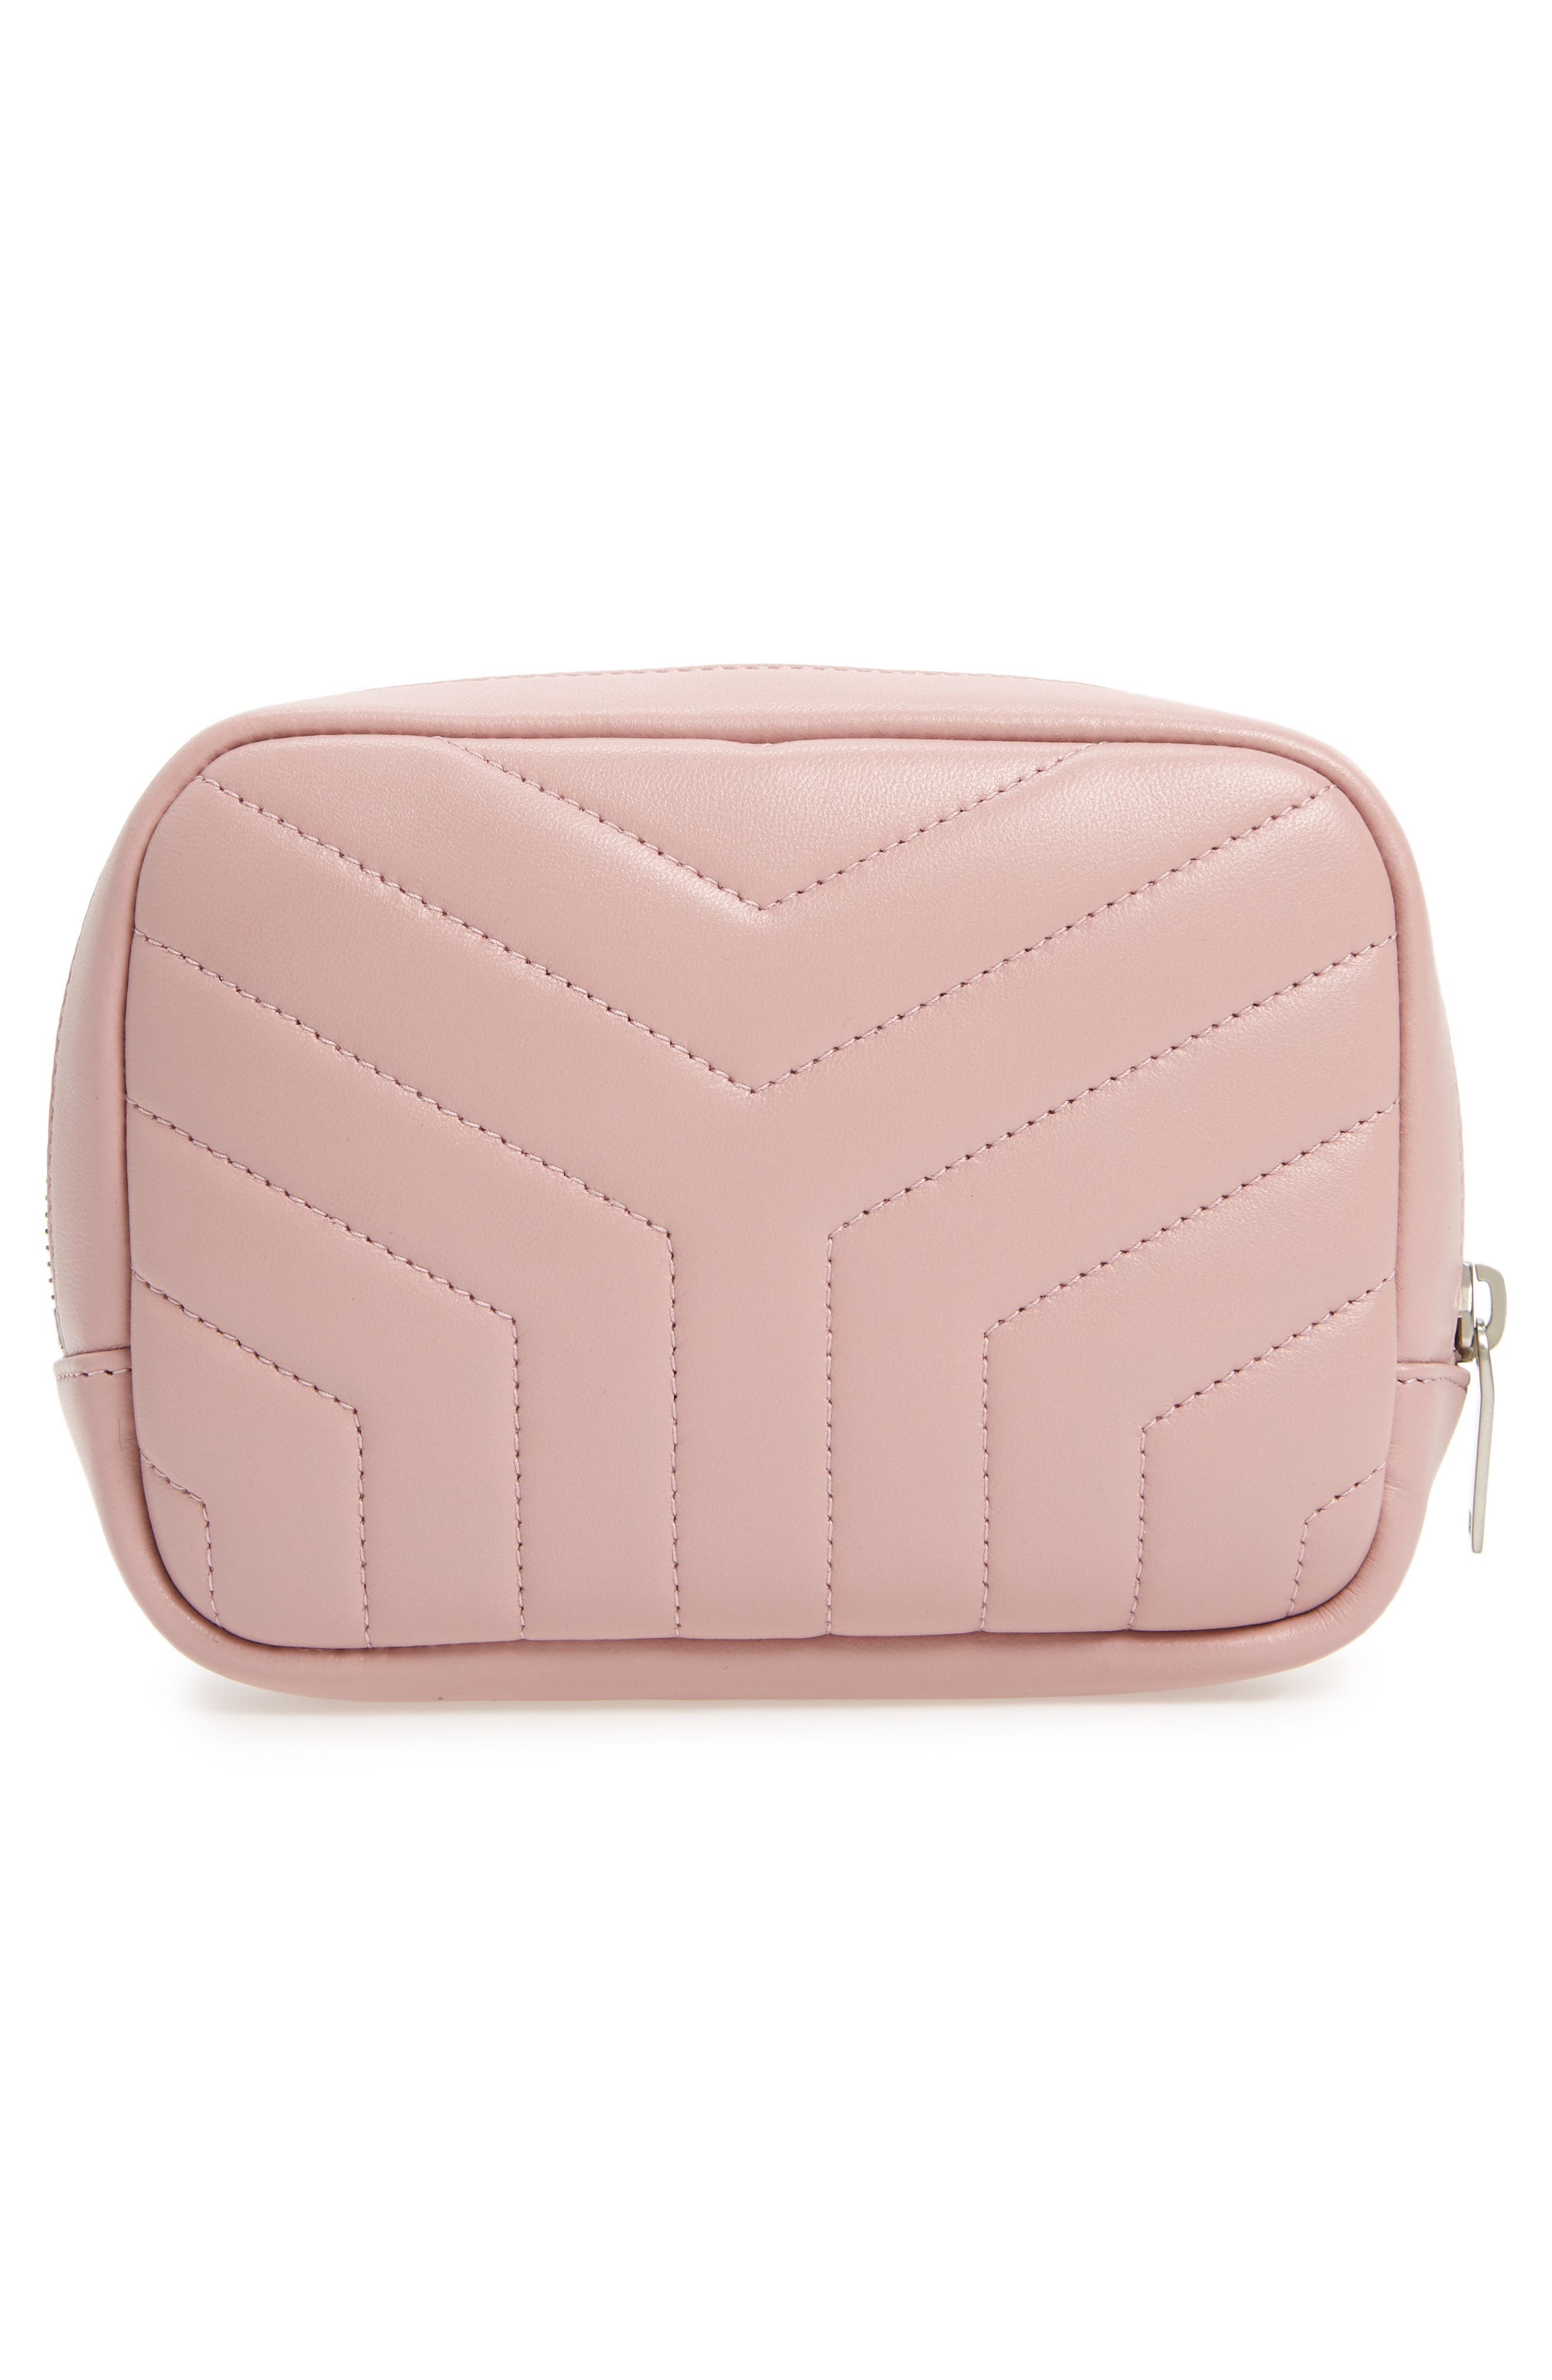 Loulou Matelassé Leather Cosmetics Bag,                             Alternate thumbnail 2, color,                             Tender Pink